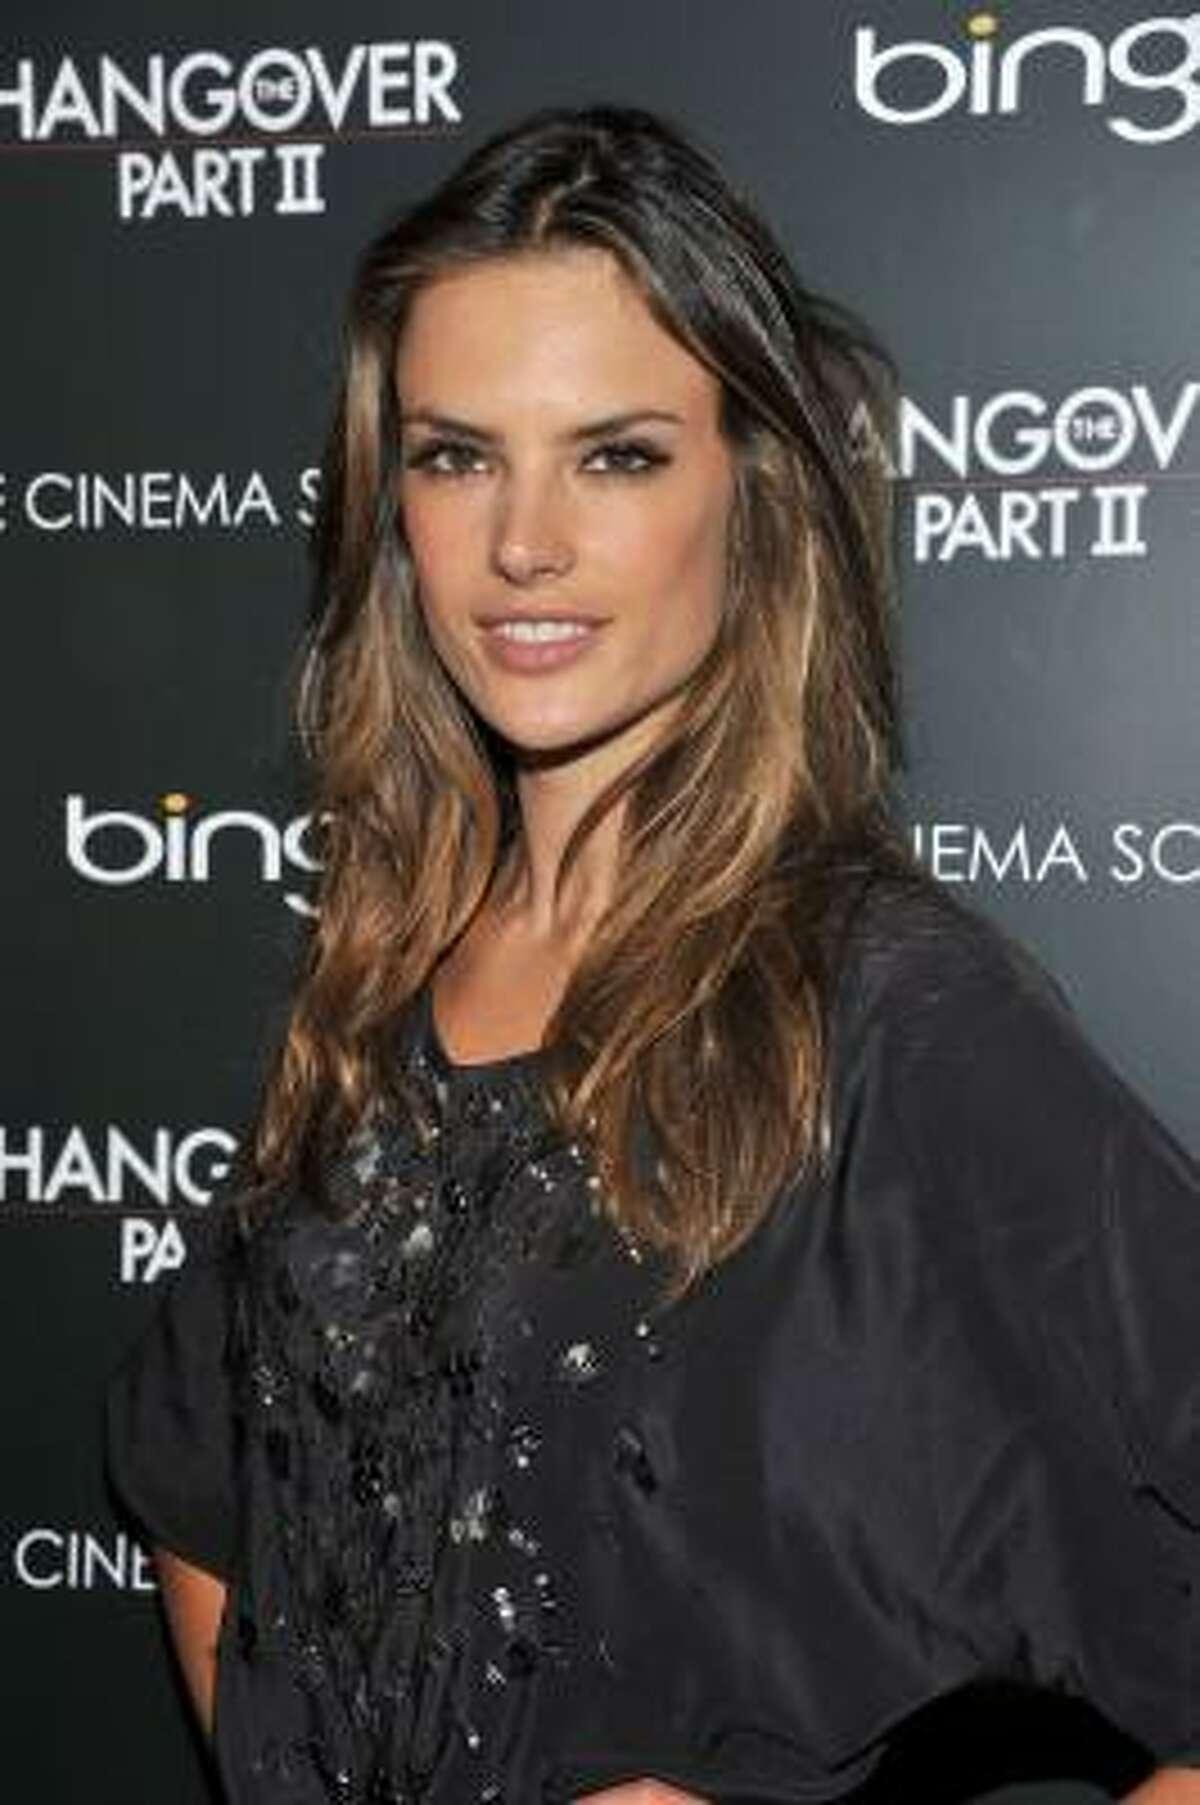 Alessandra Ambrosio Turns 30 on April 11.